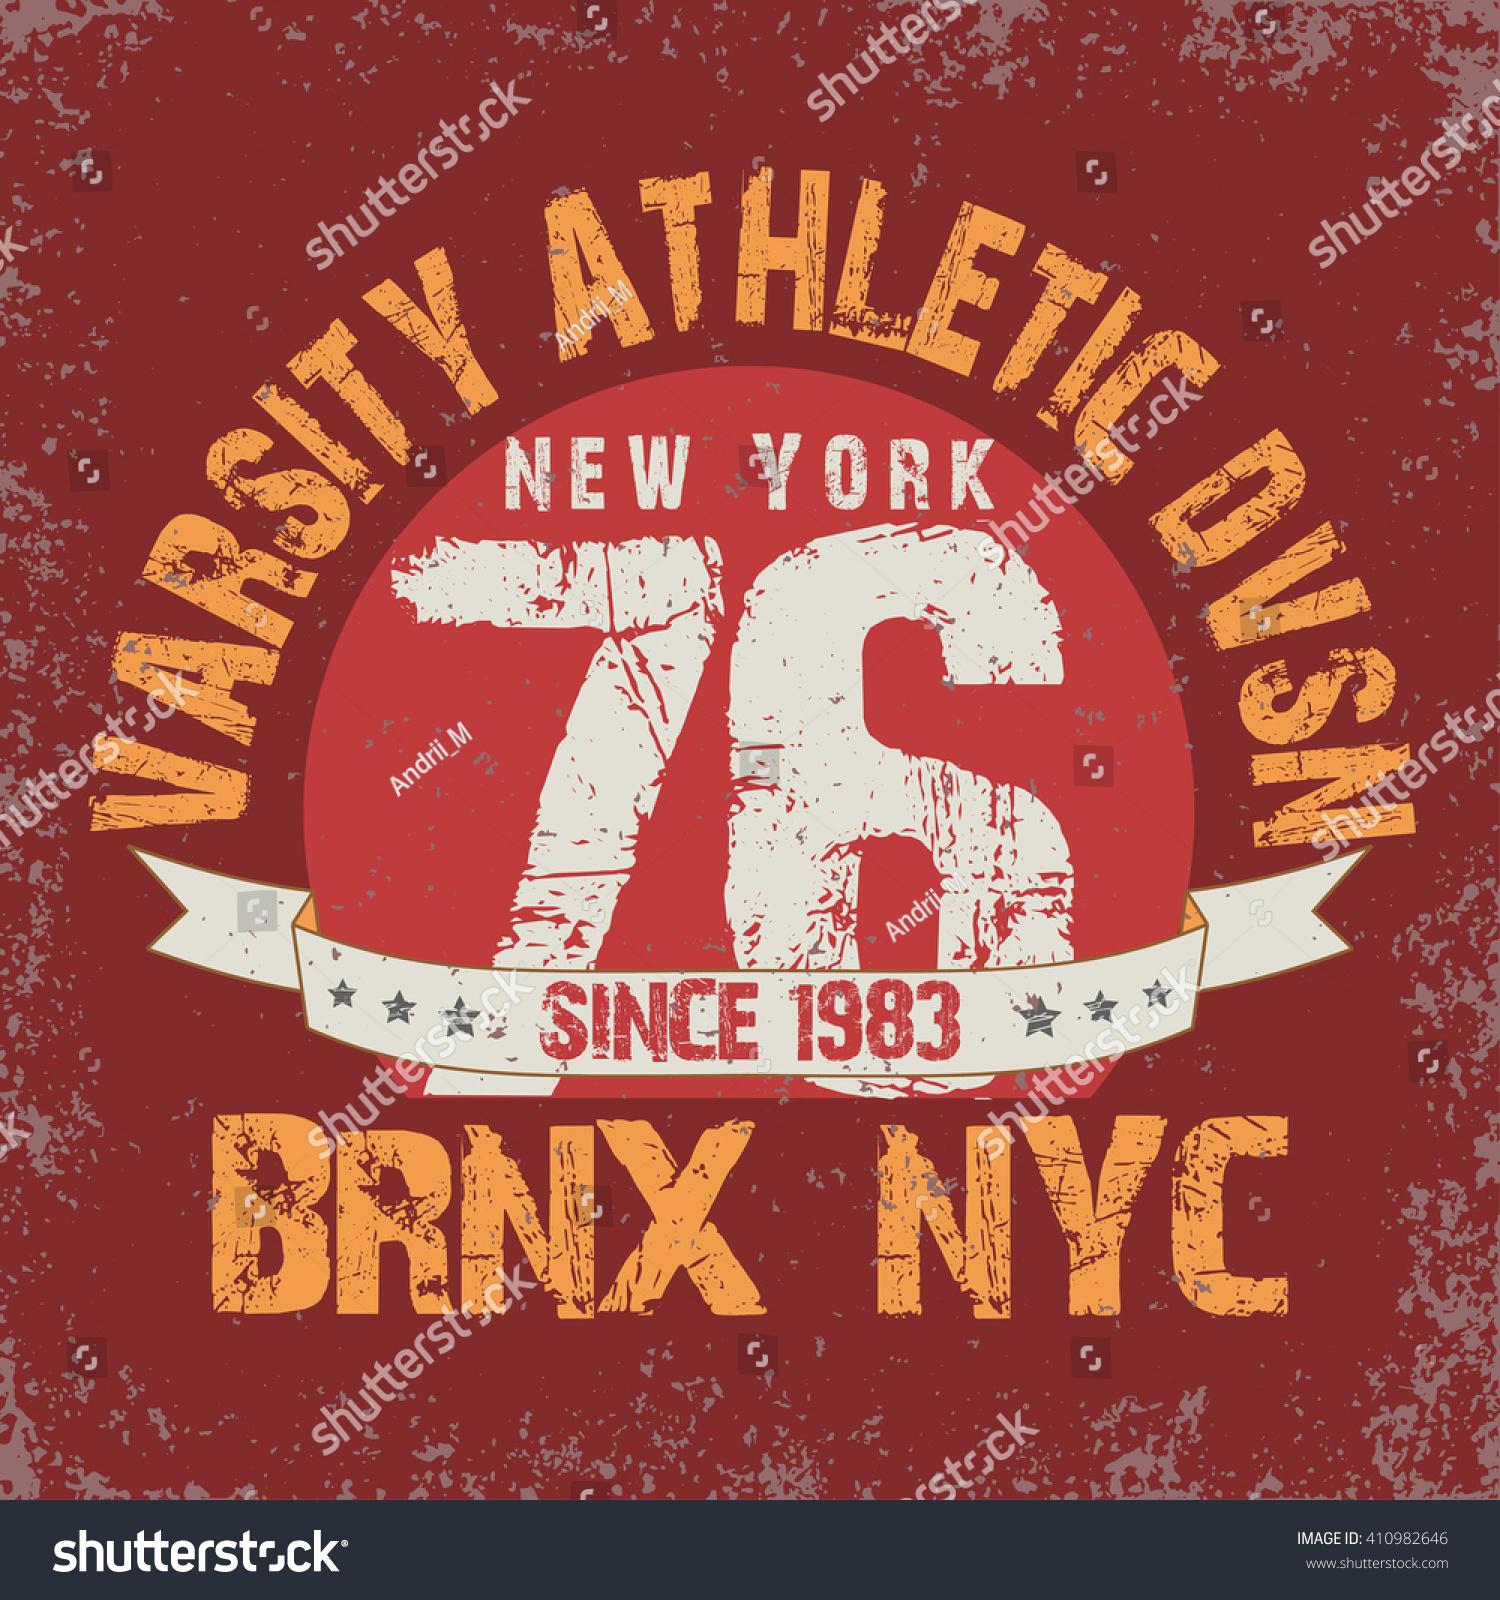 Shirt design nyc - New York College T Shirt Design Print New York City Typography Graphics New